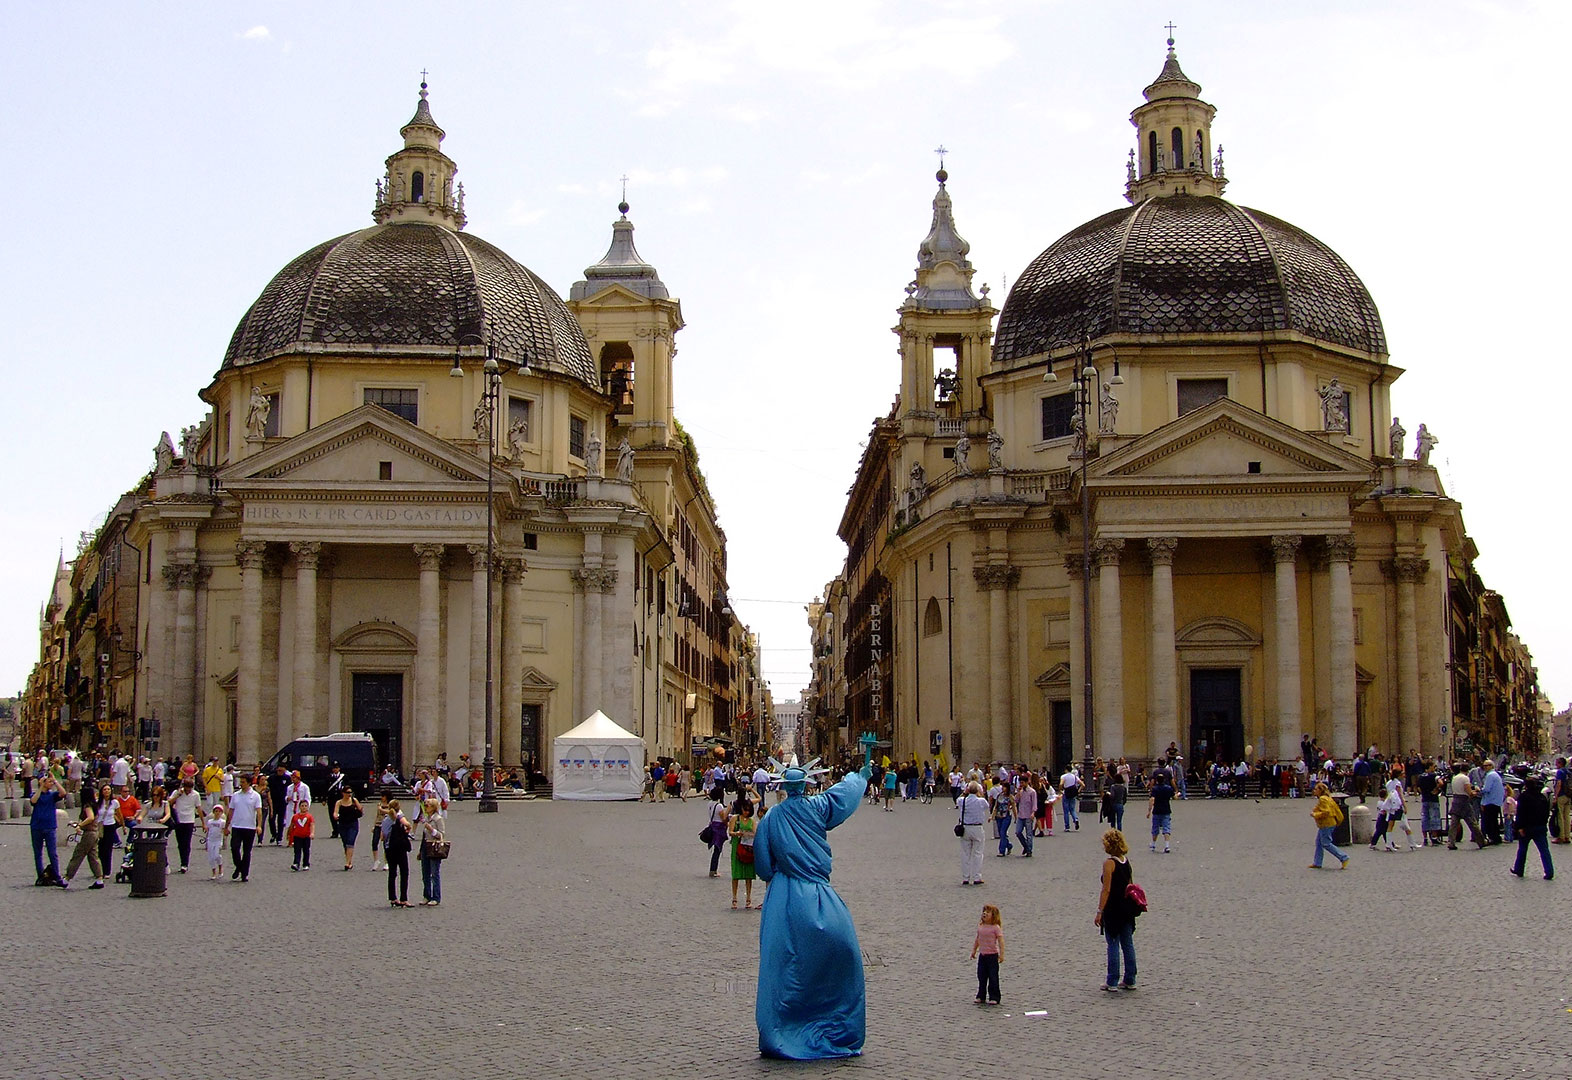 Piazza del Popolo - Meydan - Roma